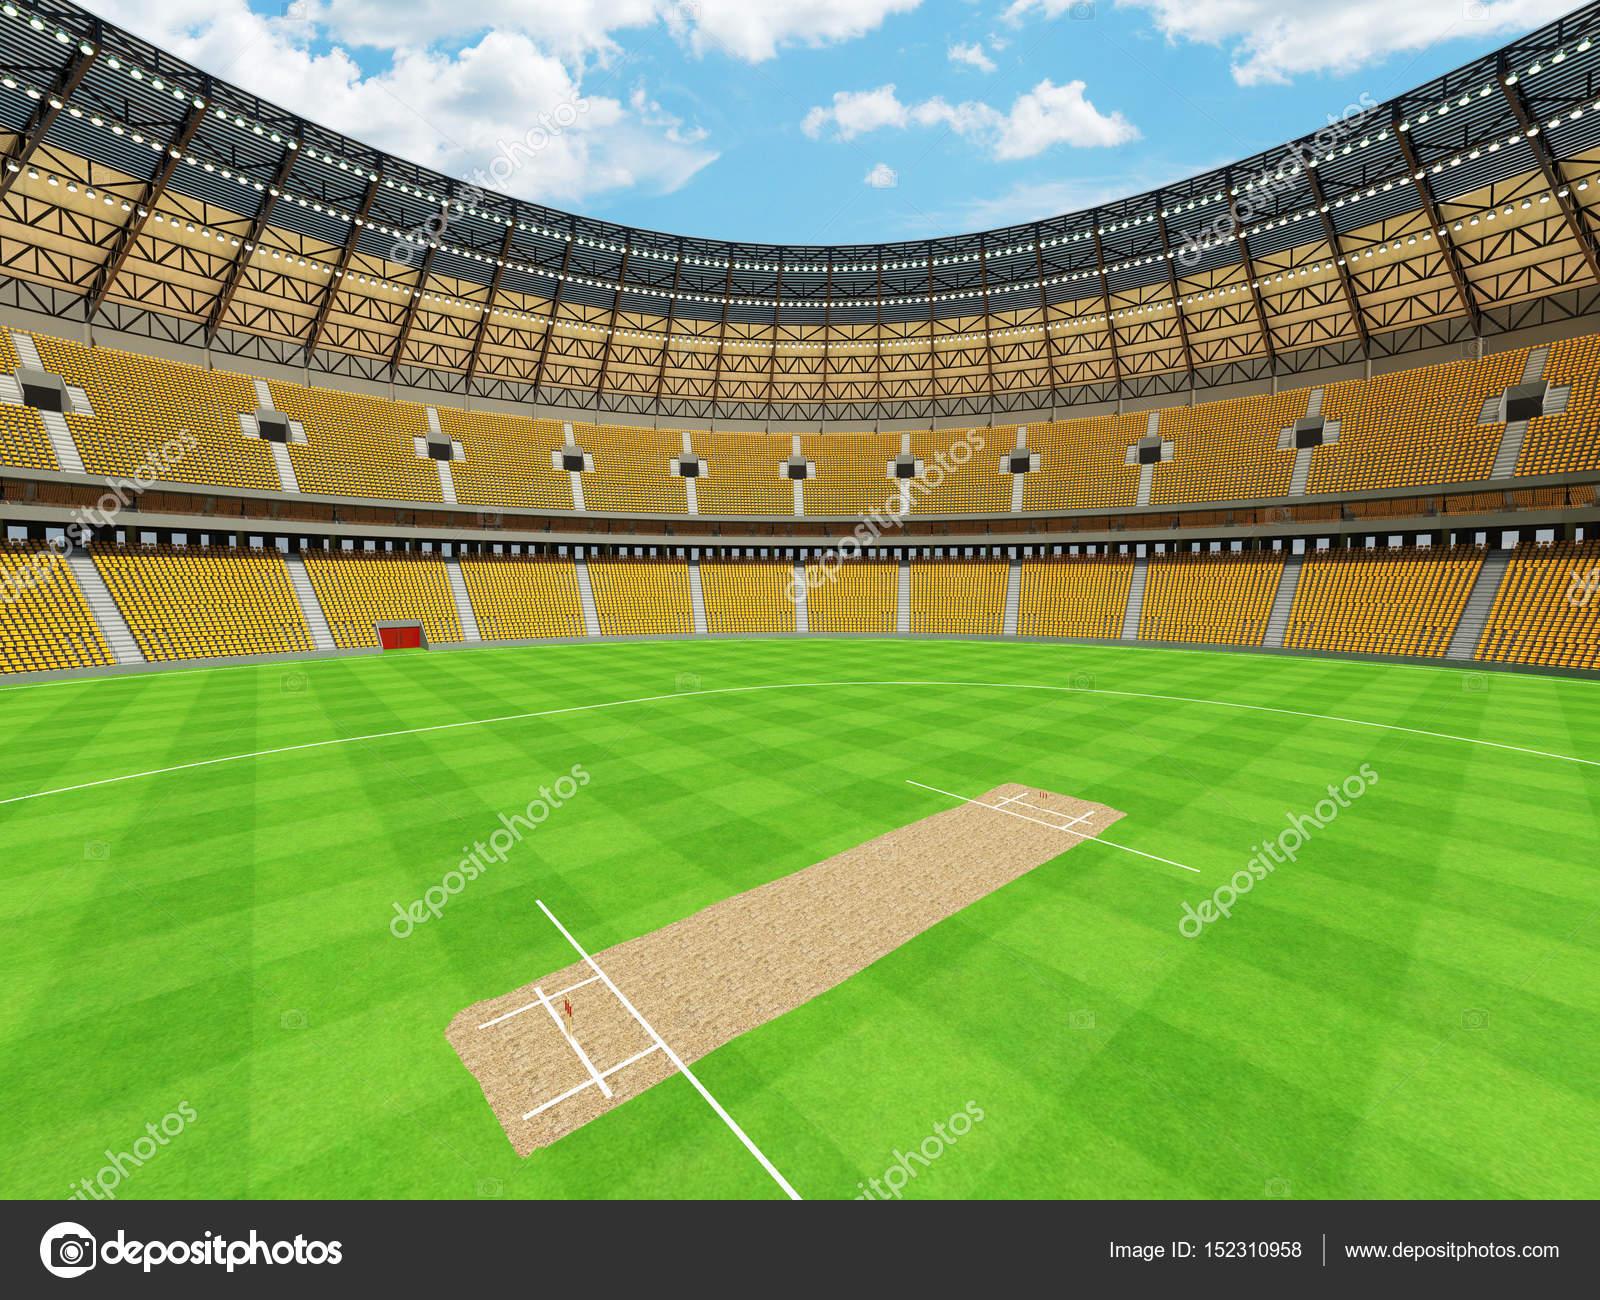 Beautiful Modern Round Cricket Stadium With Orange Seats And Vip